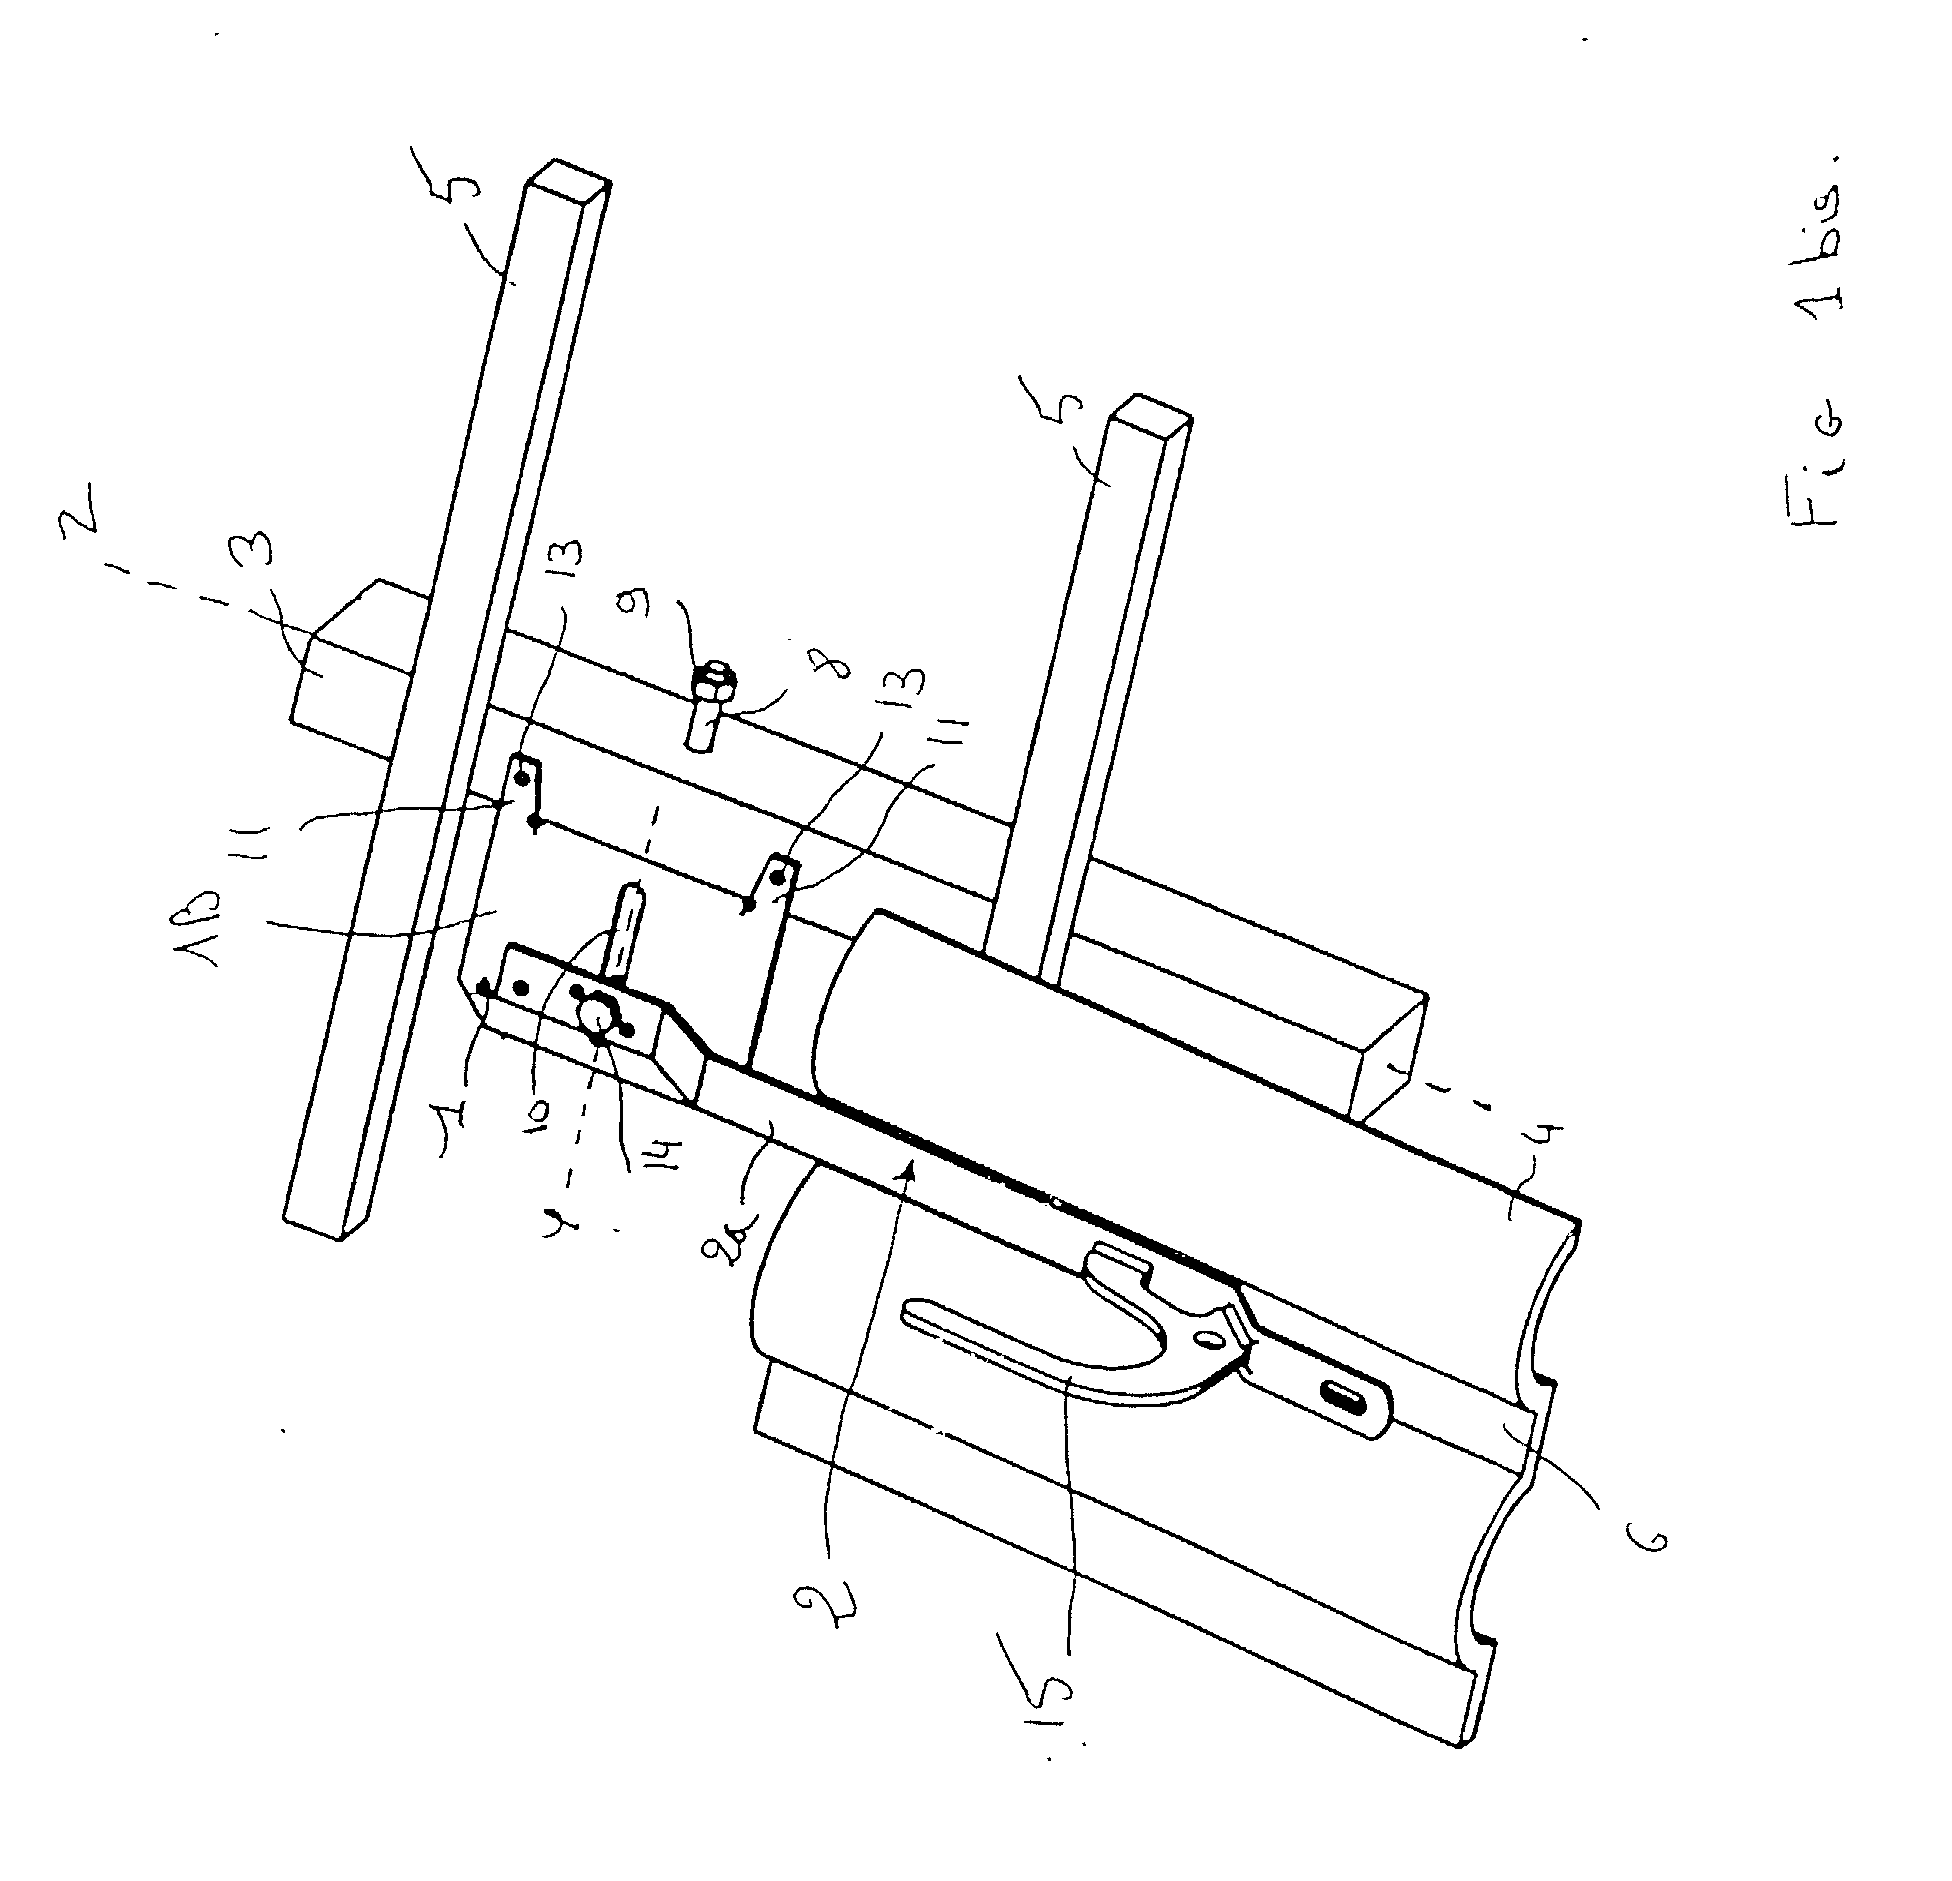 patent ep0881339a1